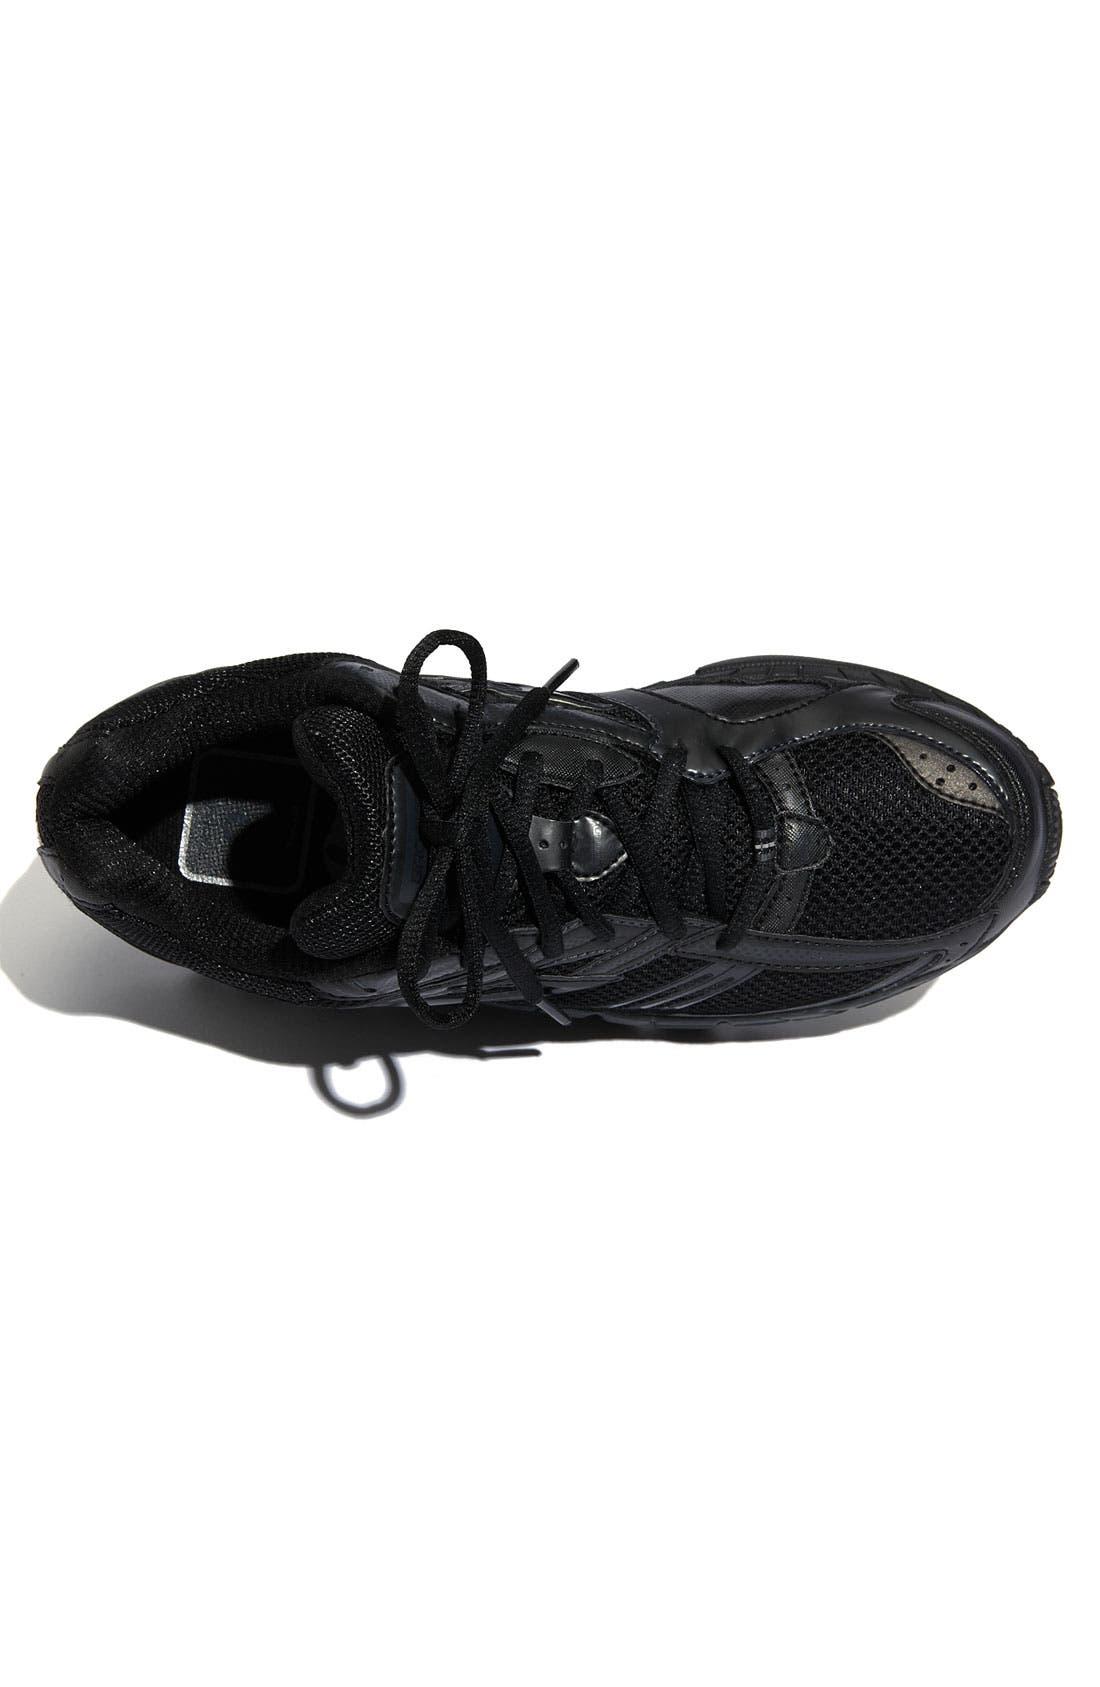 Alternate Image 3  - Brooks 'Addiction 10' Running Shoe (Men)